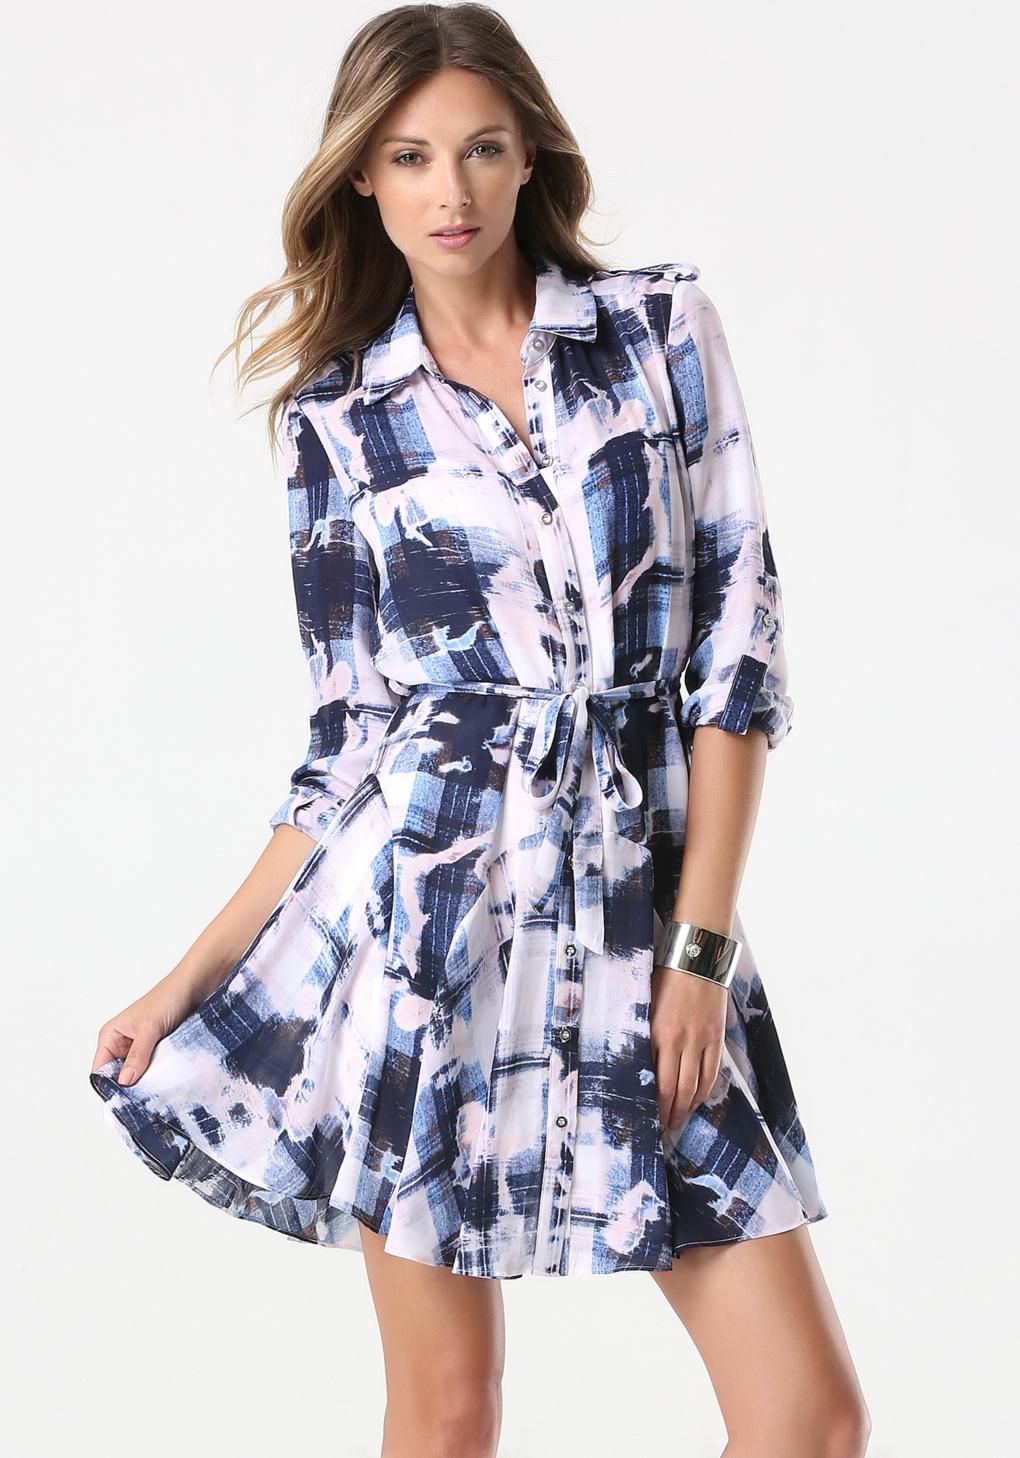 lyst bebe maiden plaid shirt dress in blue. Black Bedroom Furniture Sets. Home Design Ideas